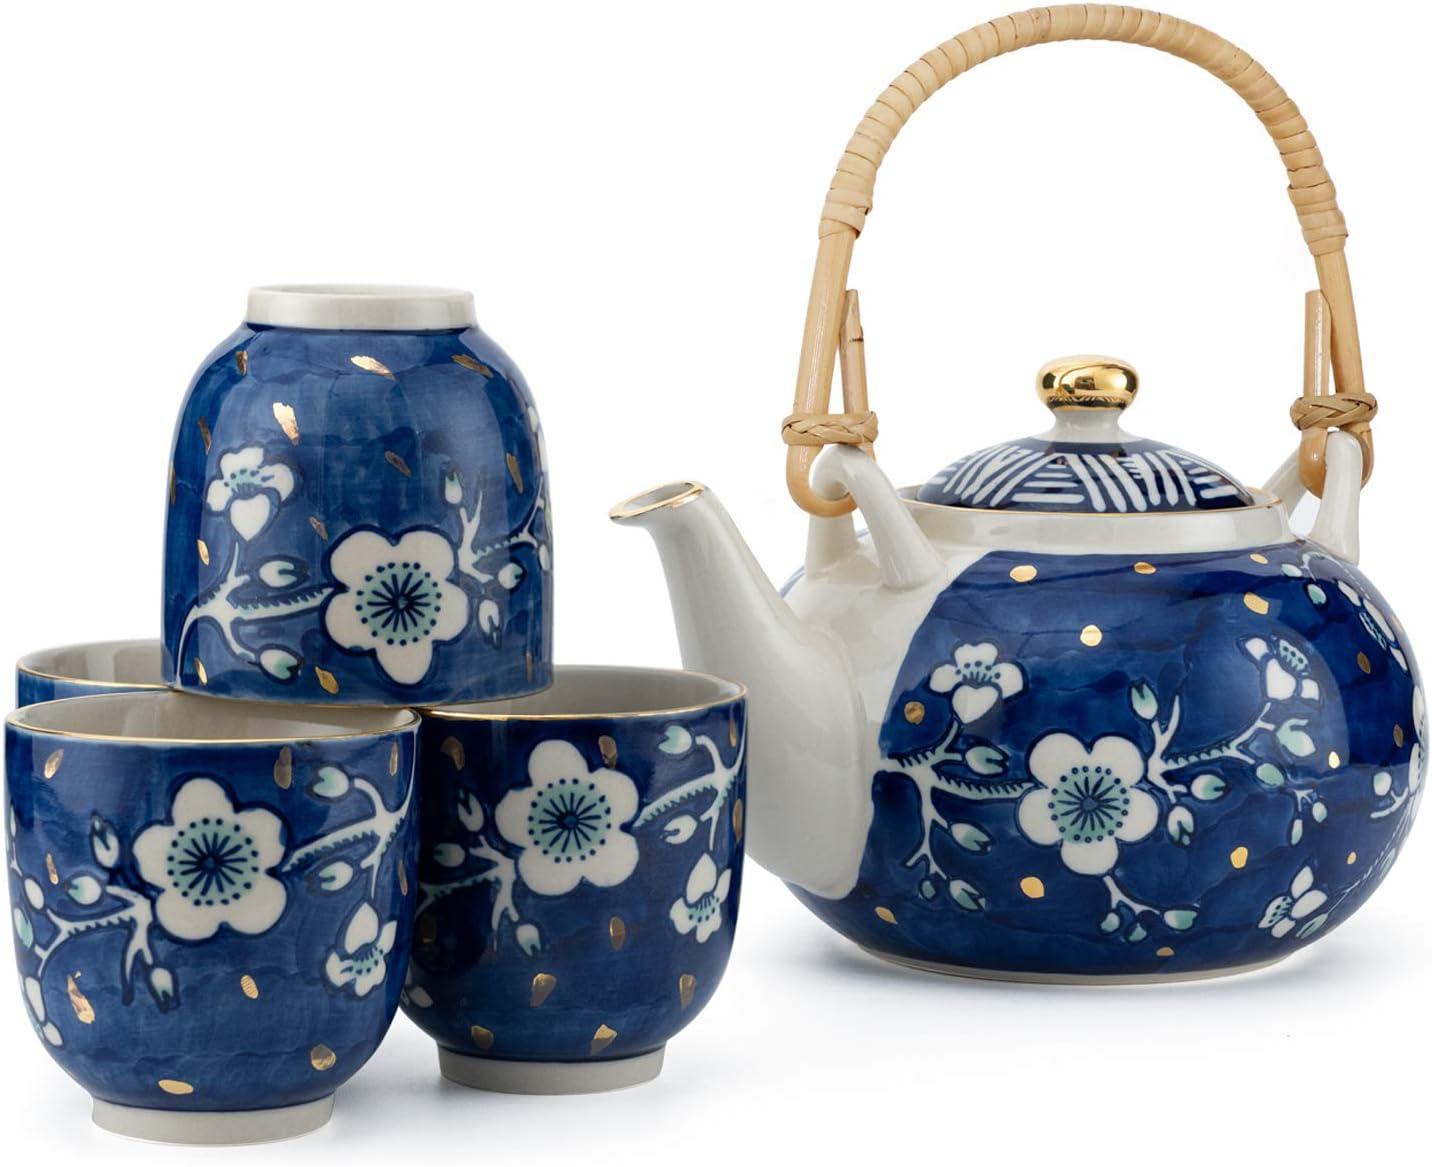 Taimei Teatime Hand Painted Tea Set, Ceramic Tea Cup Set with Infuser, Set for 4 Tea Server Sets and Tea Pot (25fl oz) for Loose Leaf Tea, Blue and White